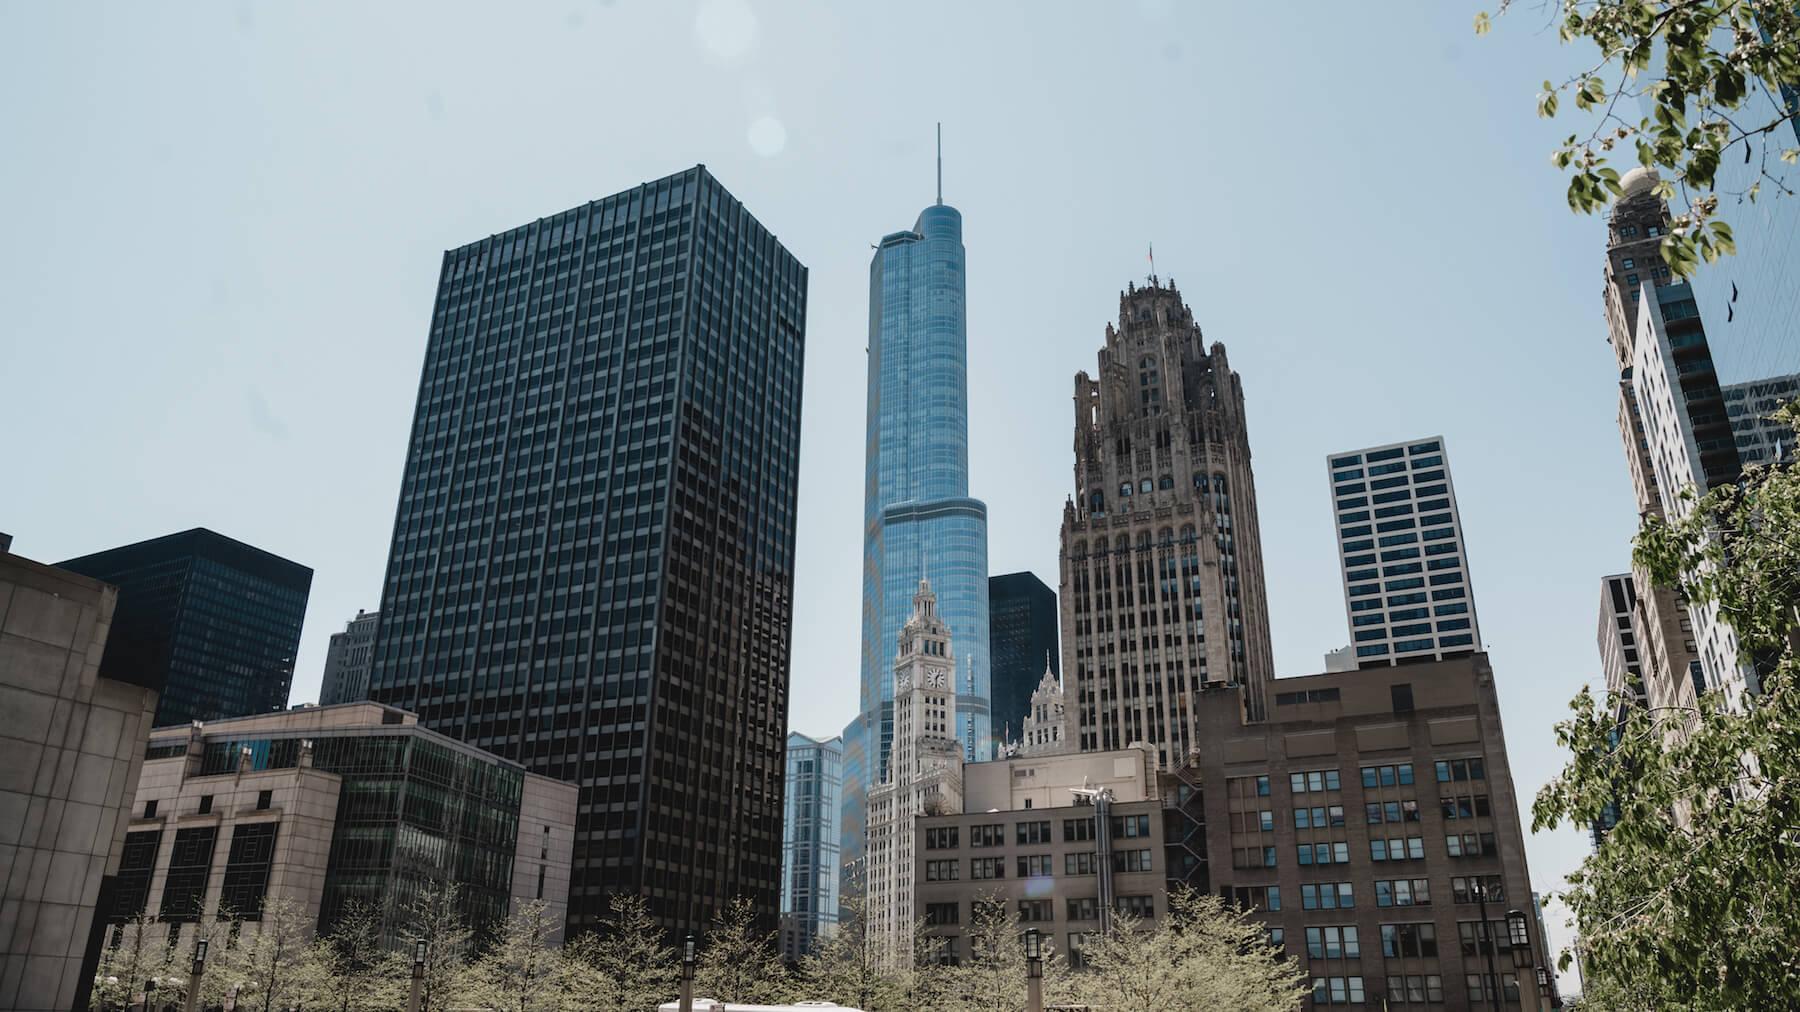 engle-olson-chicago-family-reunion-16.jpg